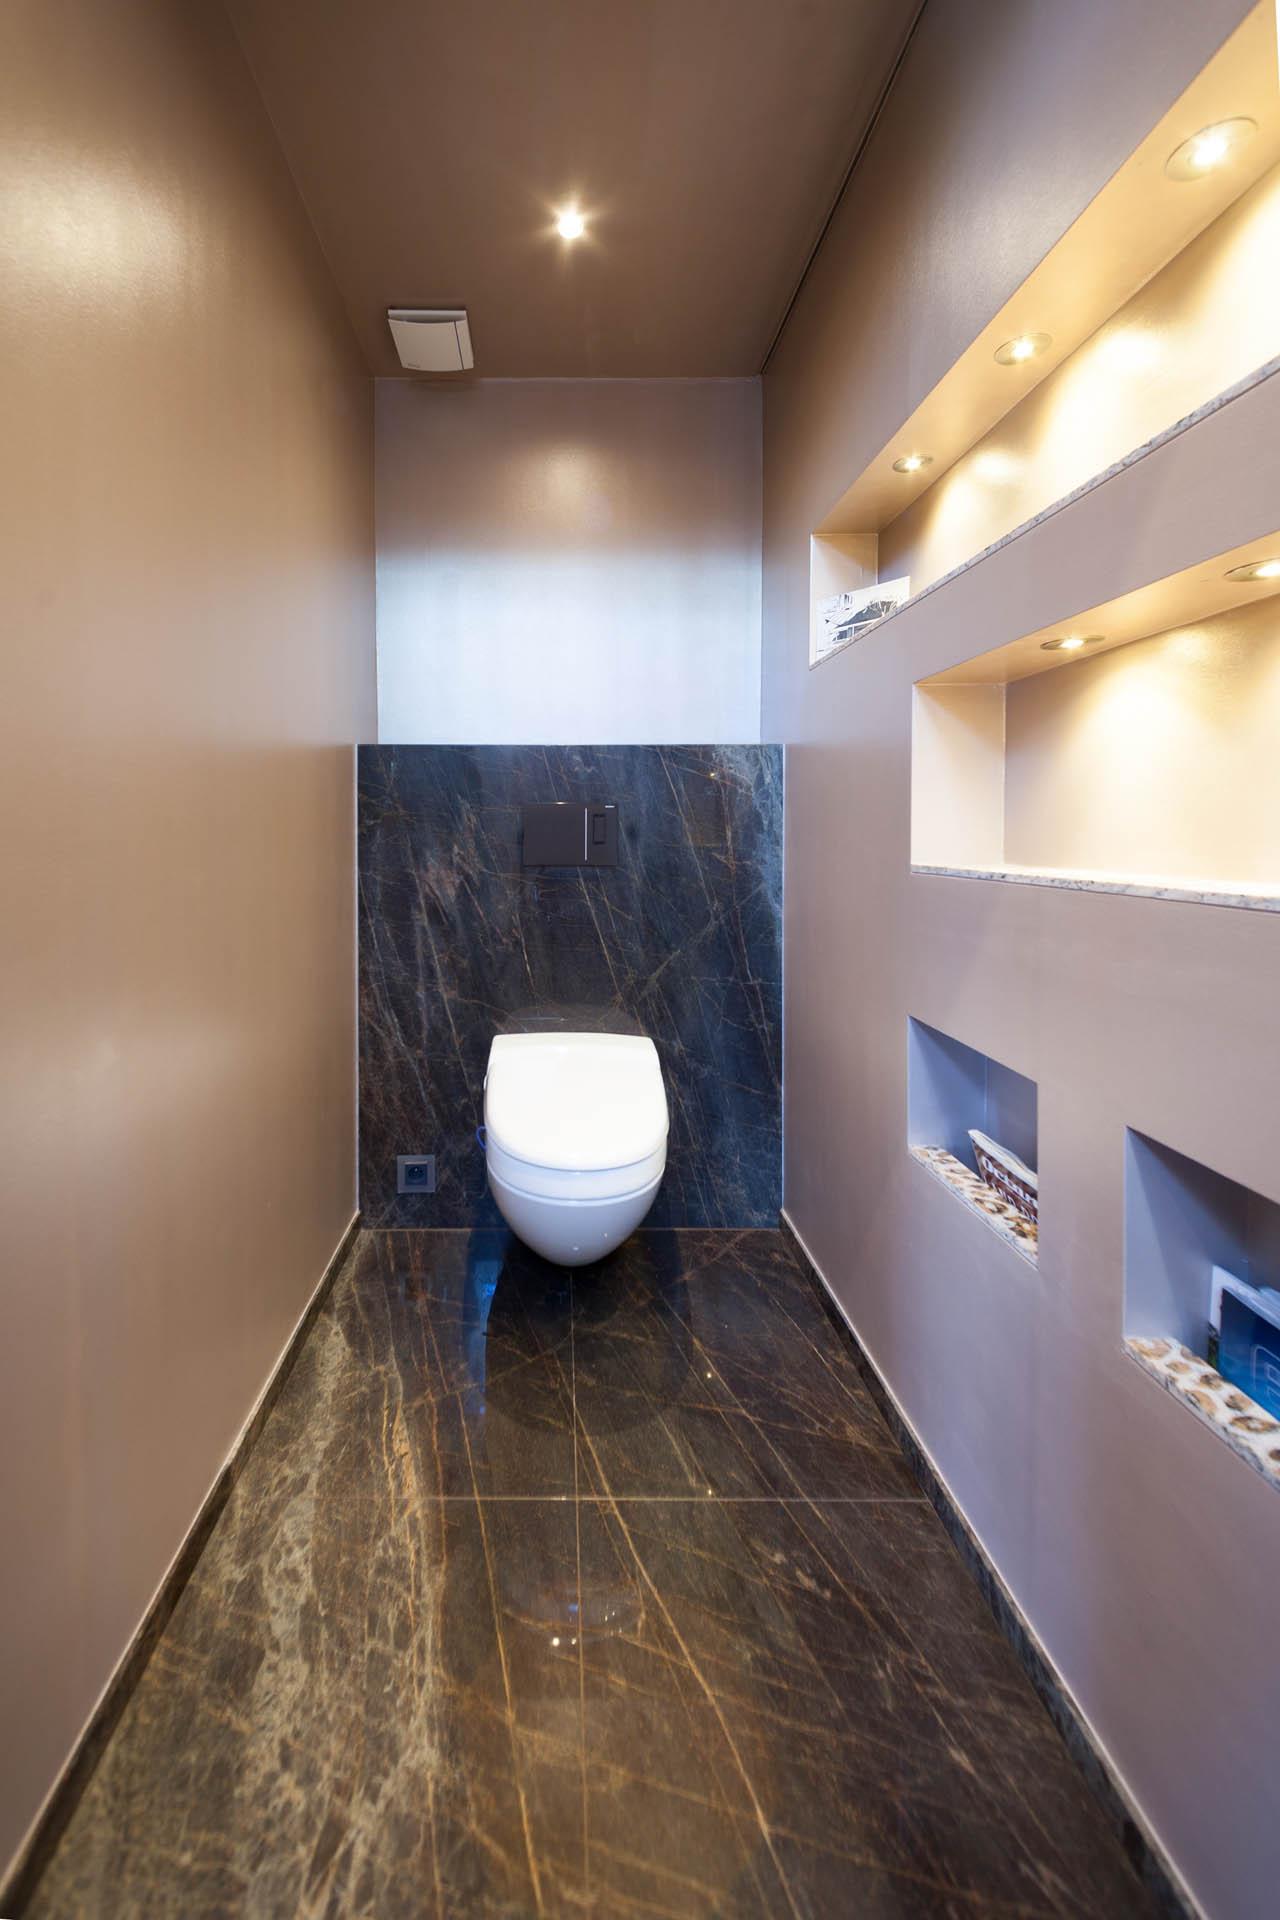 Toilettenausbau mit Naturstein